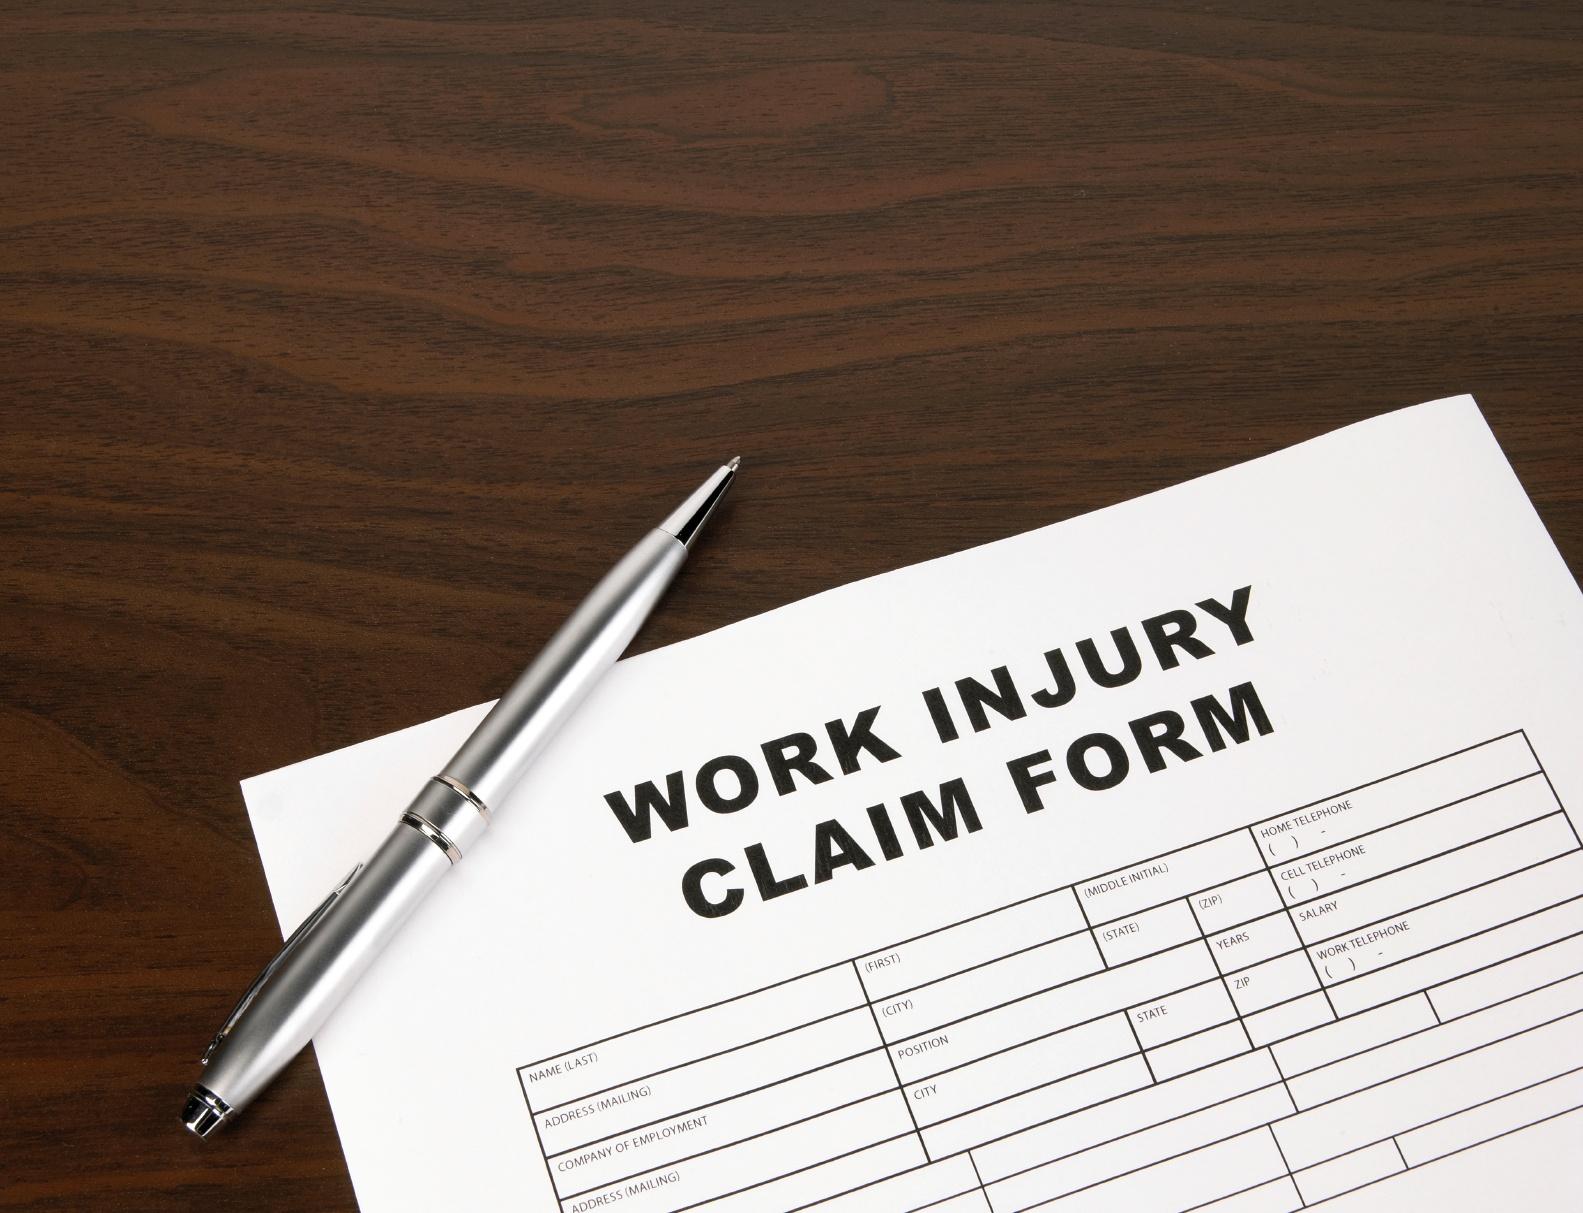 work-injury-claim-form